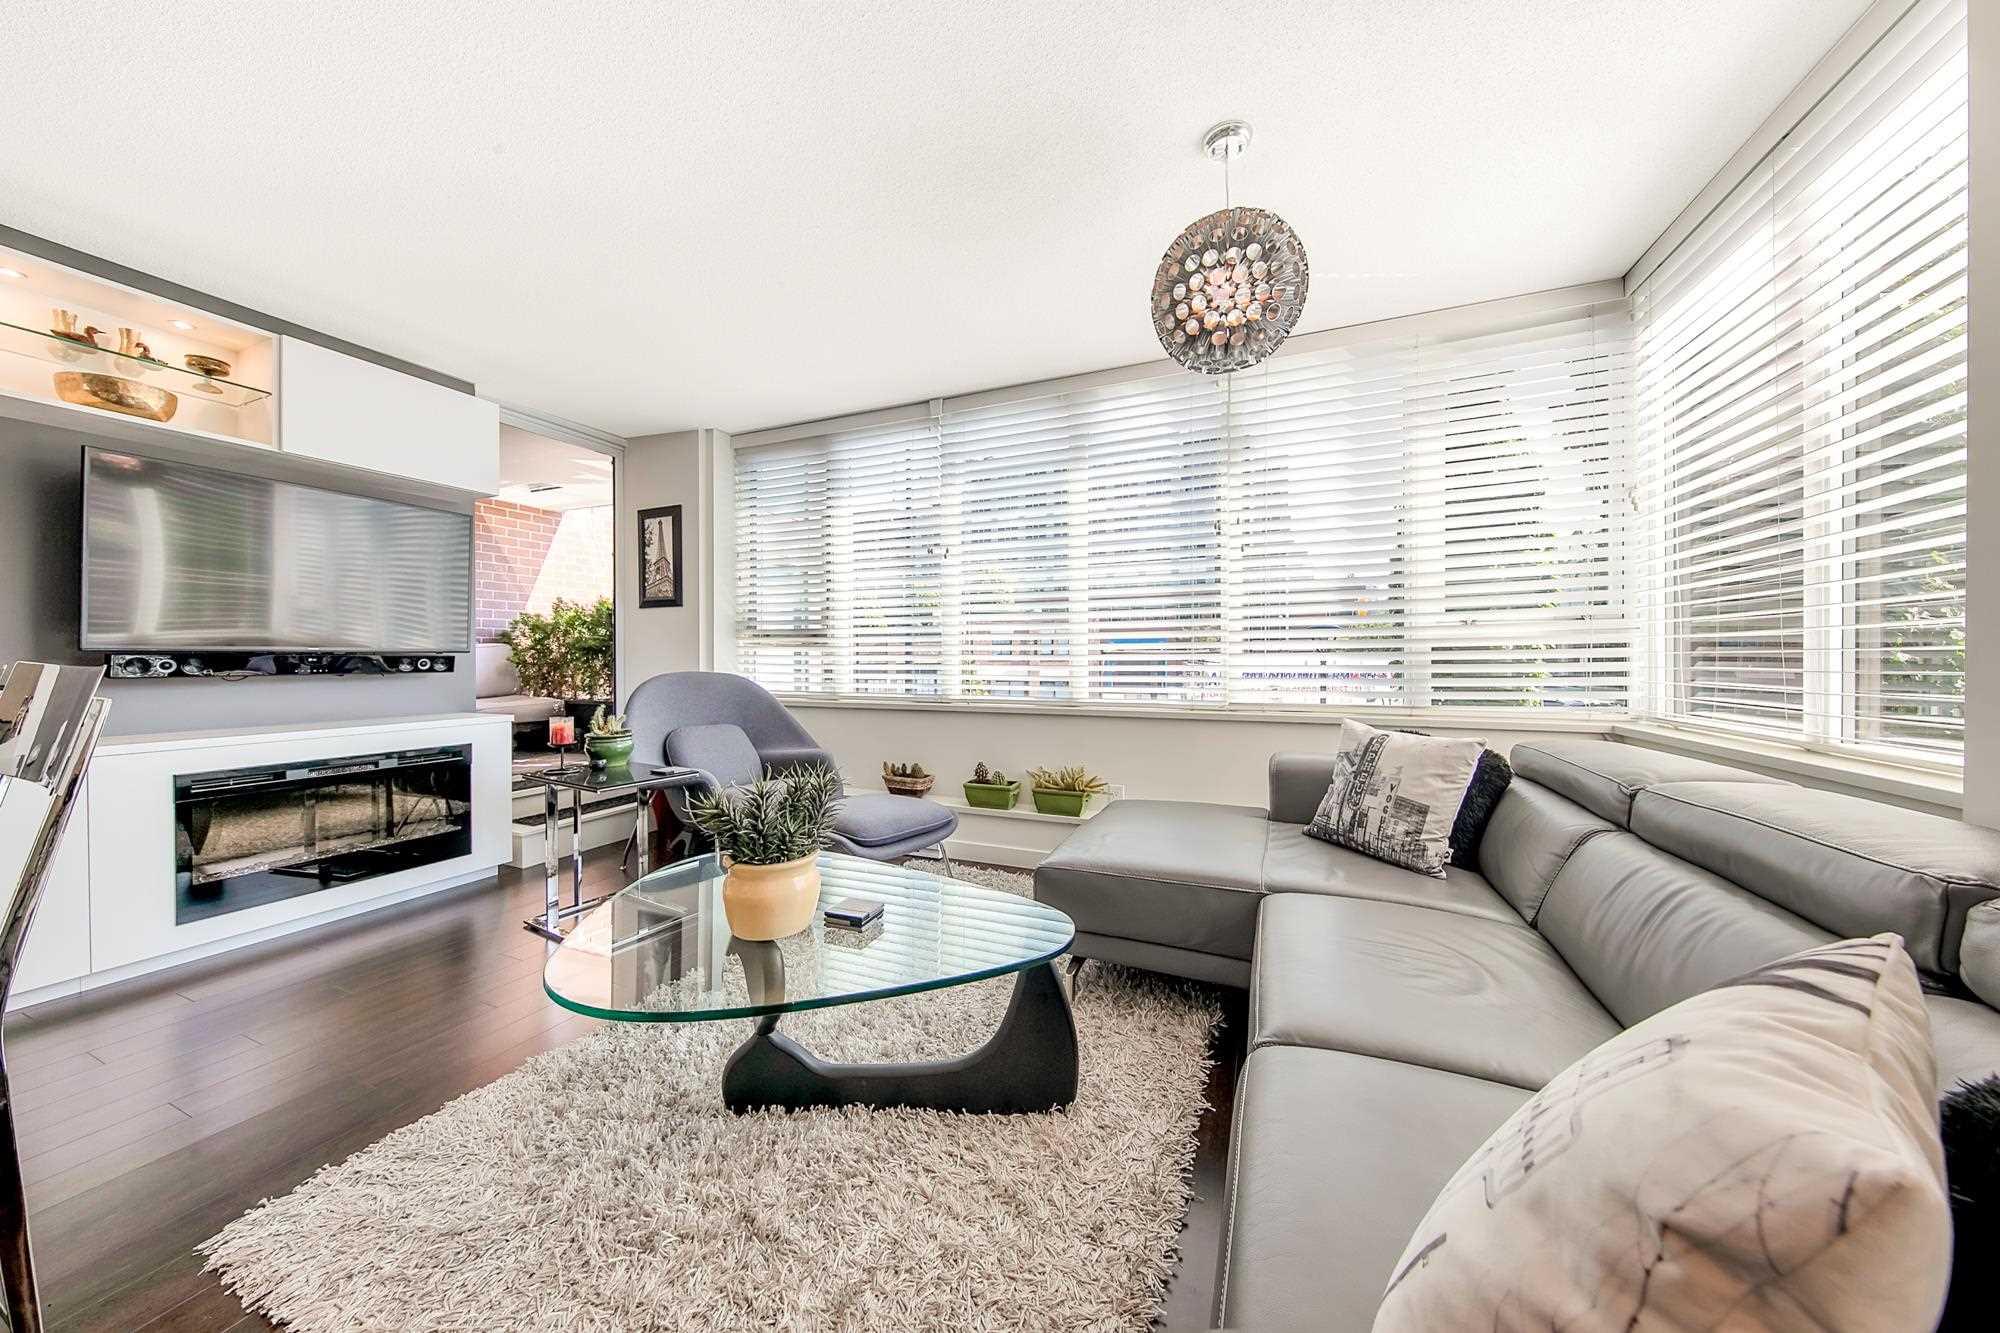 211 445 W 2ND AVENUE - False Creek Apartment/Condo for sale, 2 Bedrooms (R2605225)